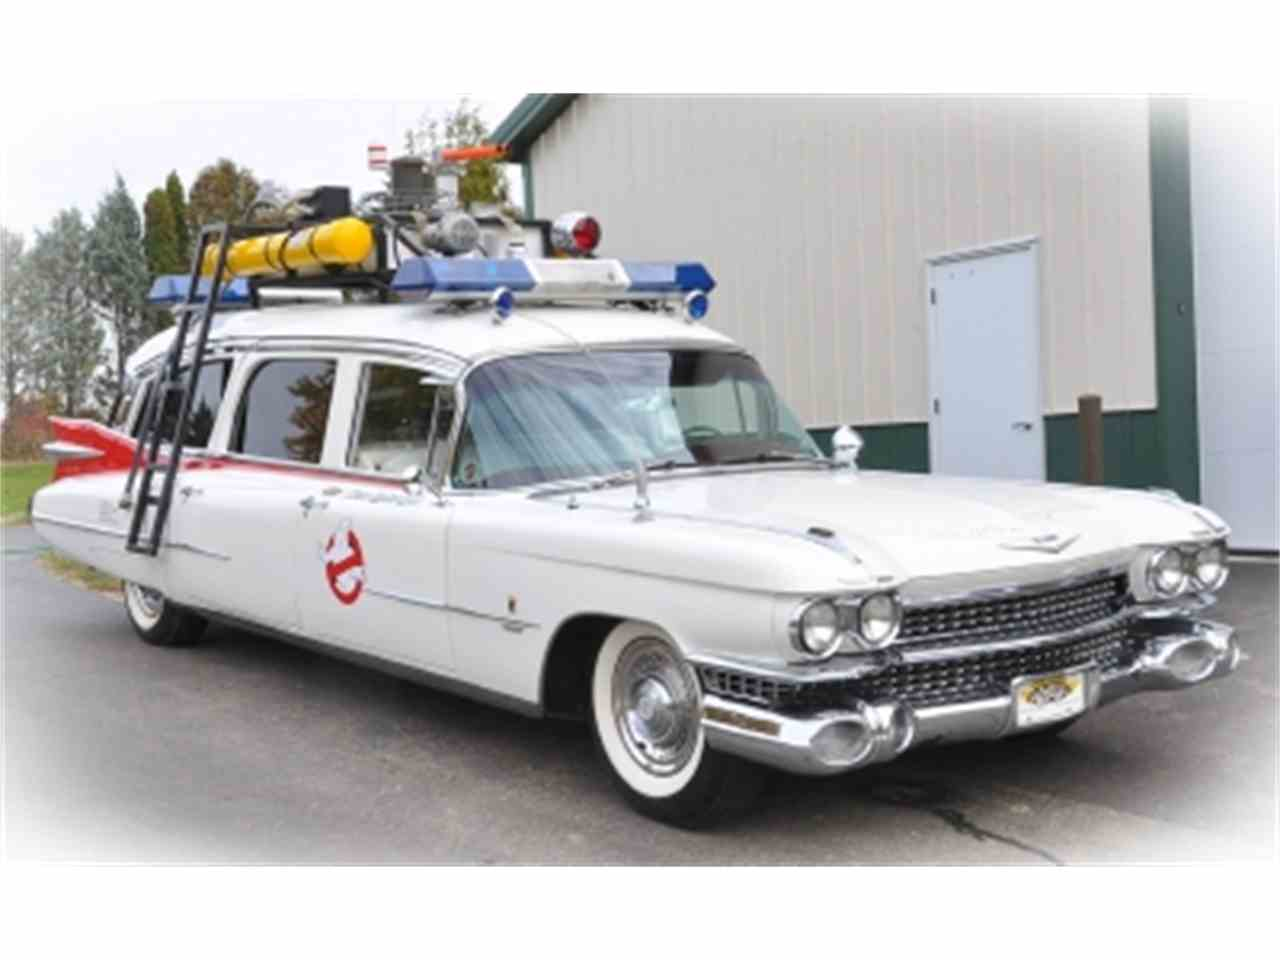 classic illinois mundelein fleetwood cadillac car near hearse sale cars american for